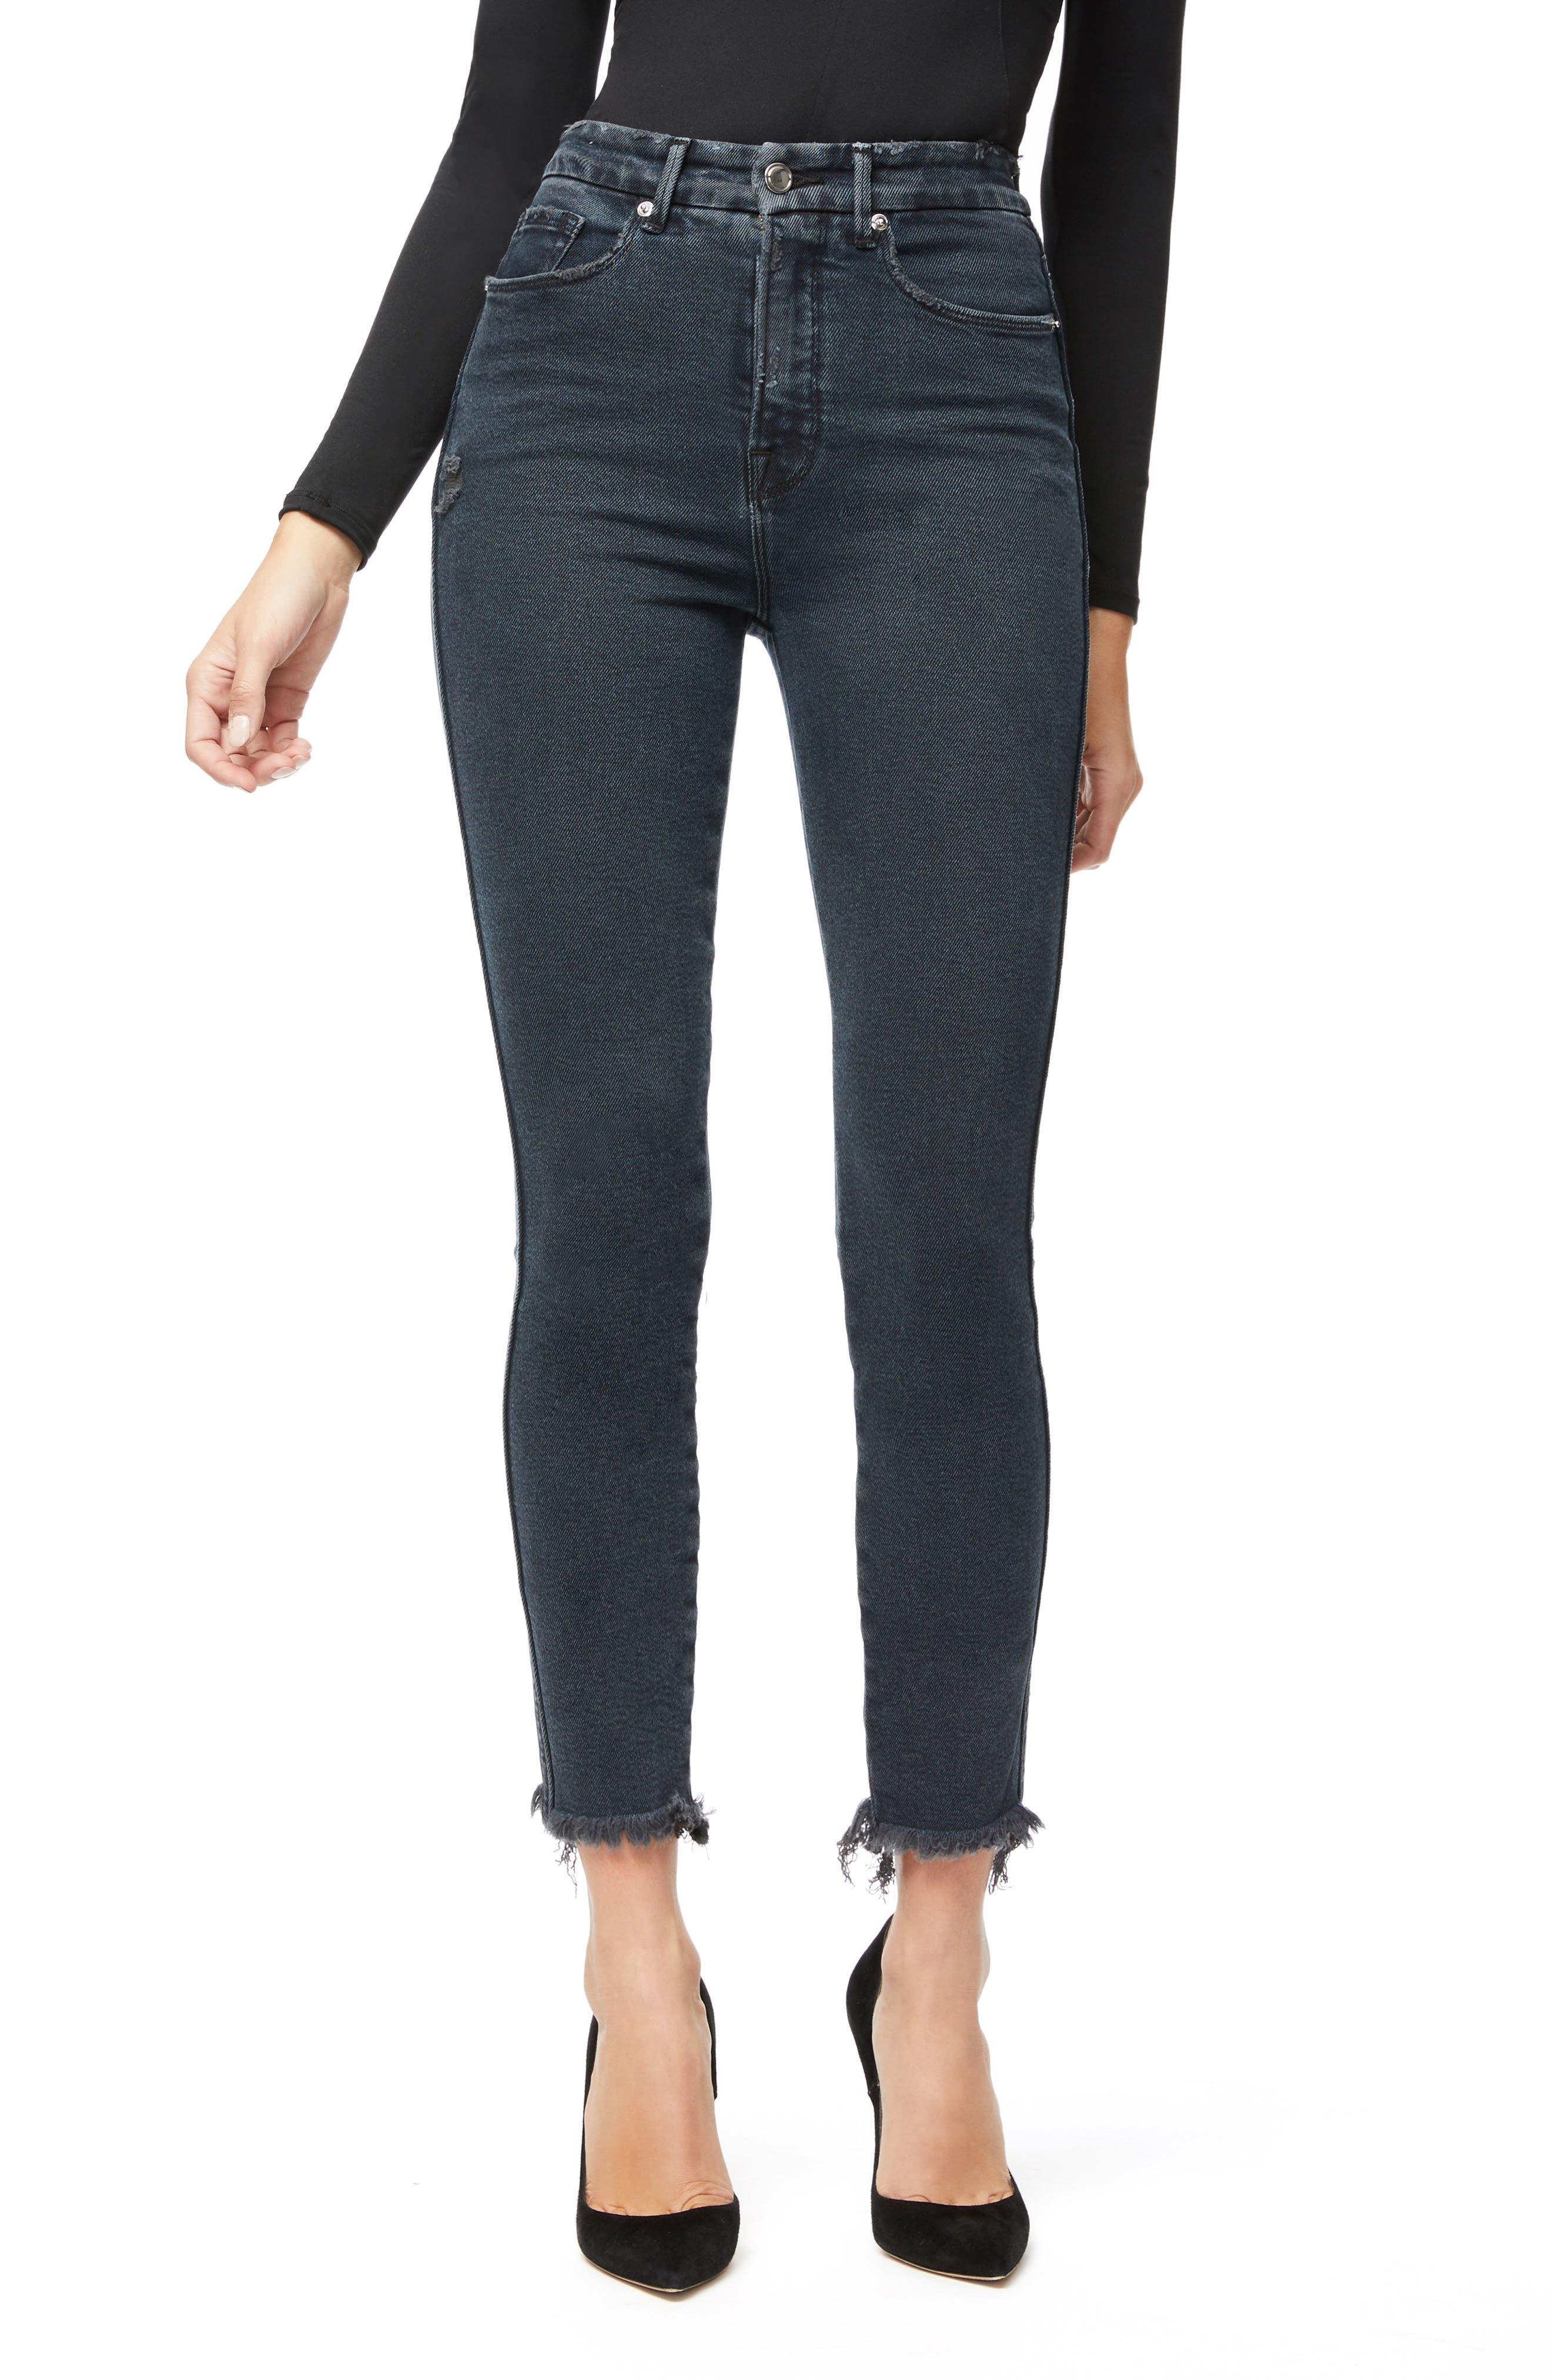 Image of Good American Good Curve Skinny Raw Edge Jeans